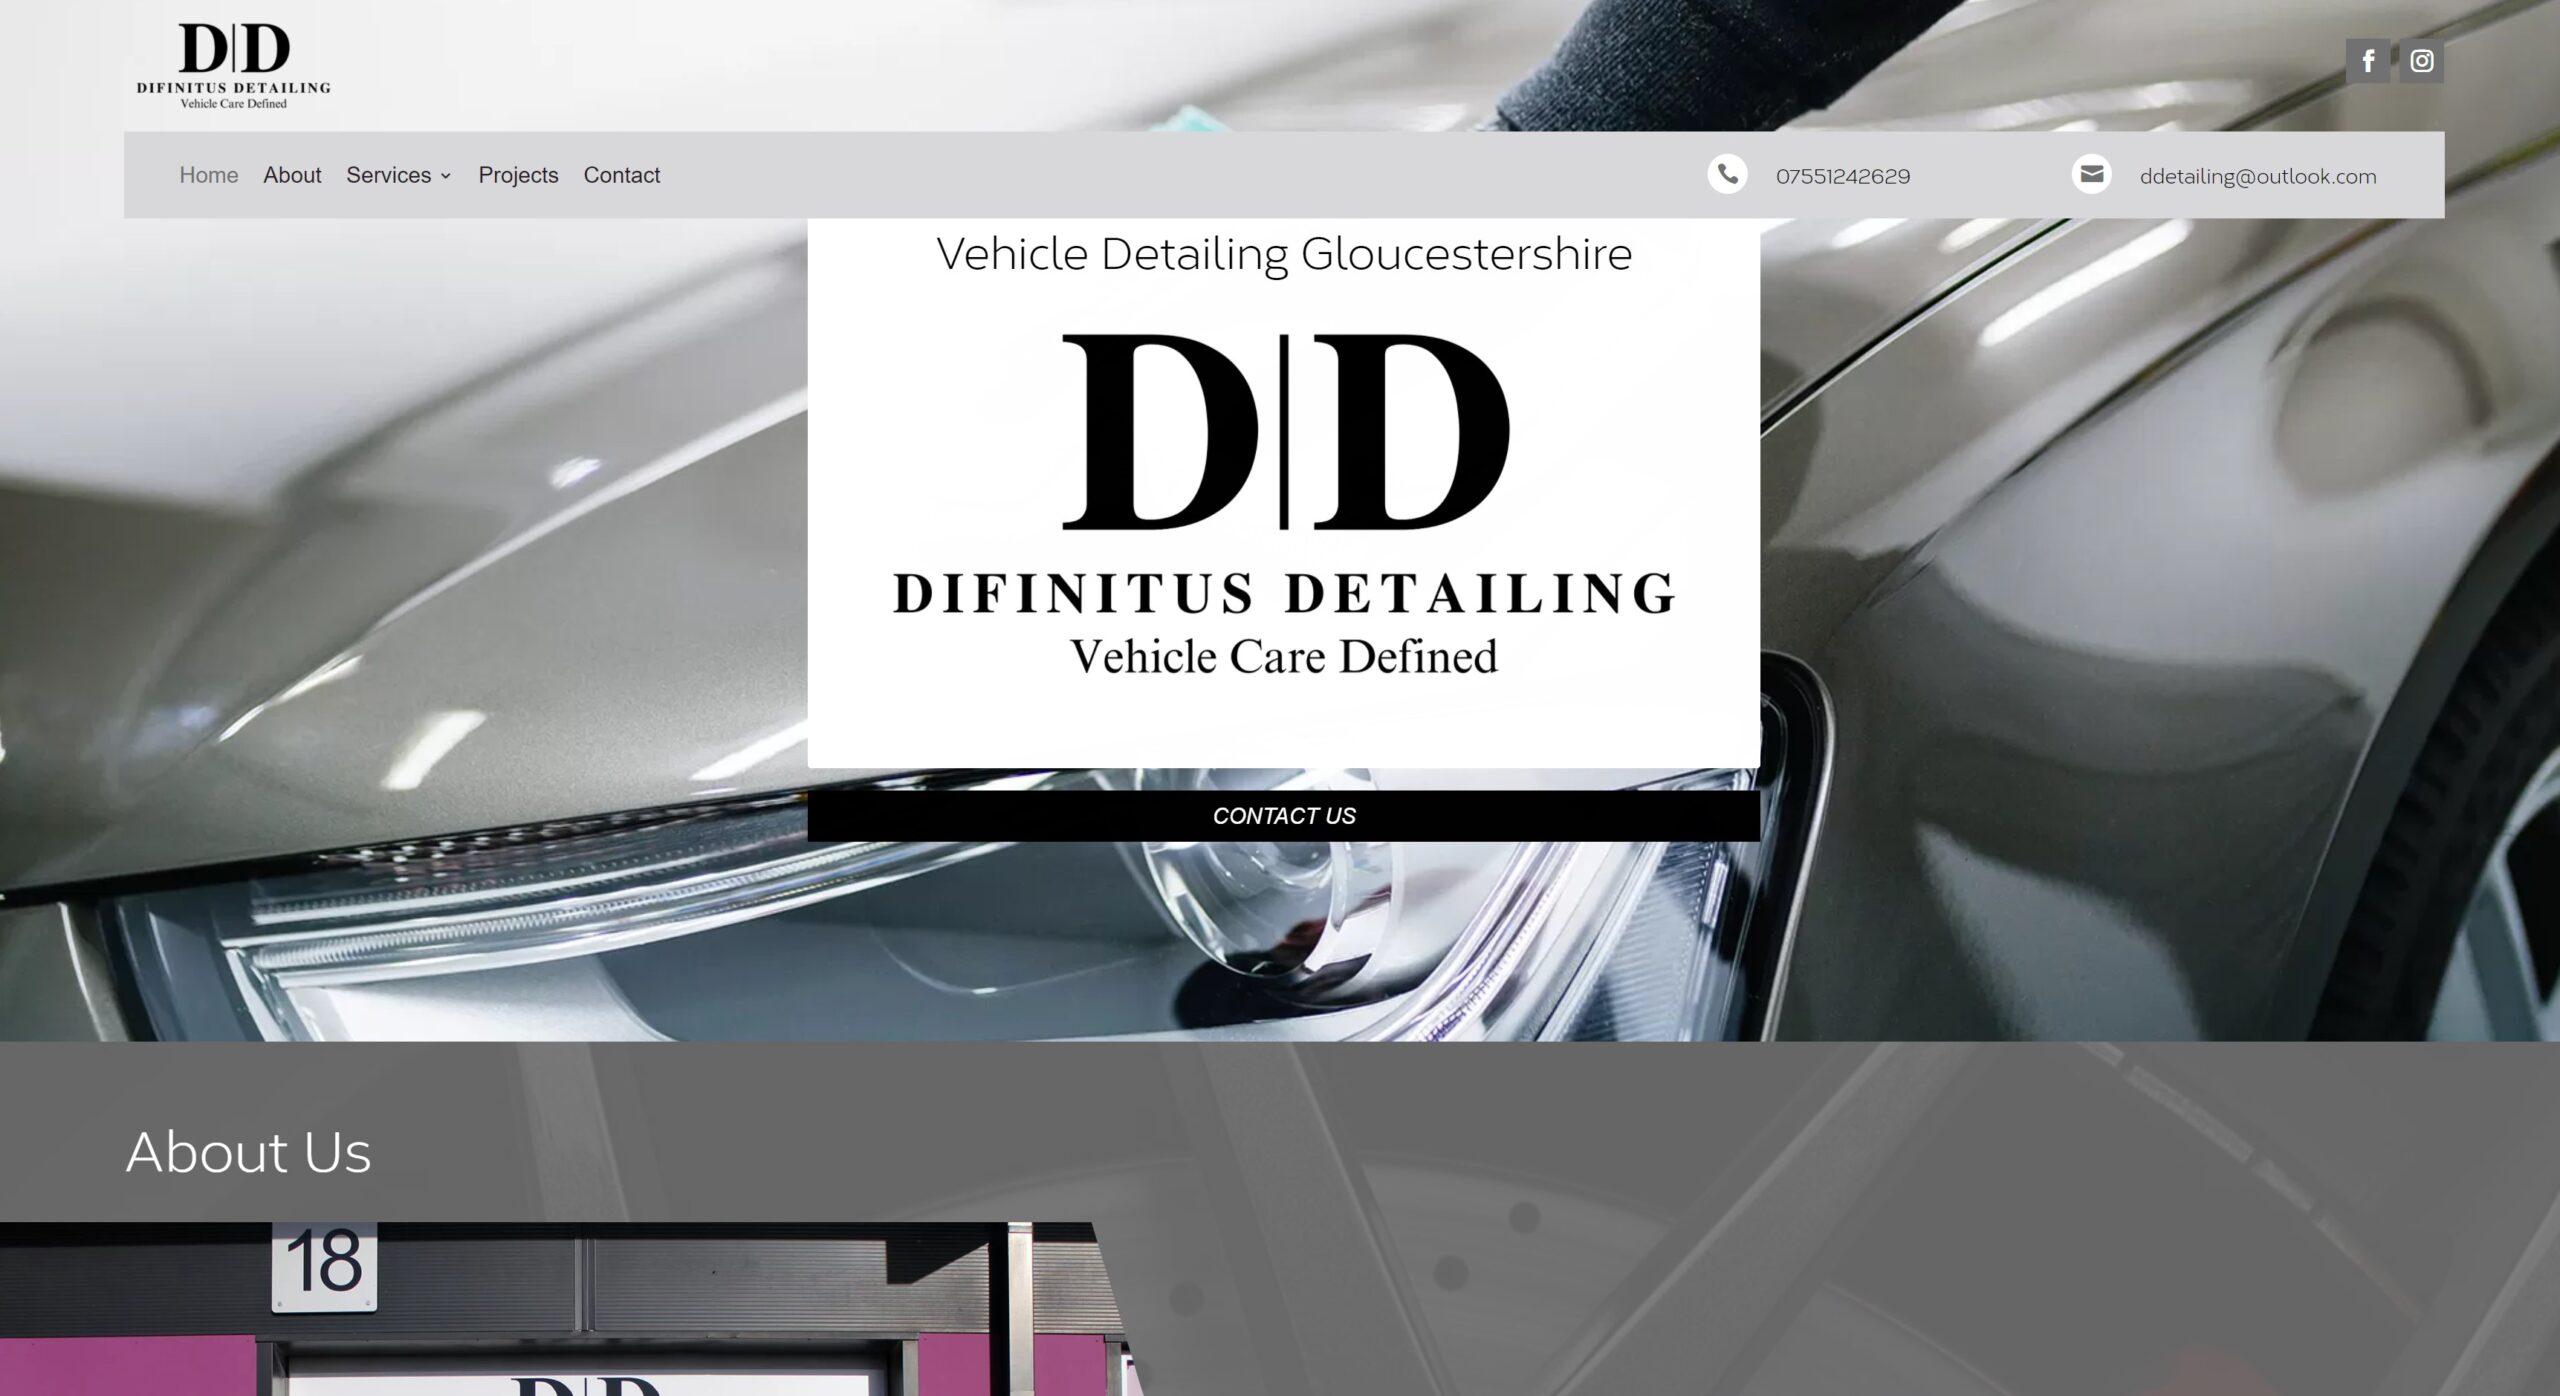 Difinitus Detailing Screenshot scaled